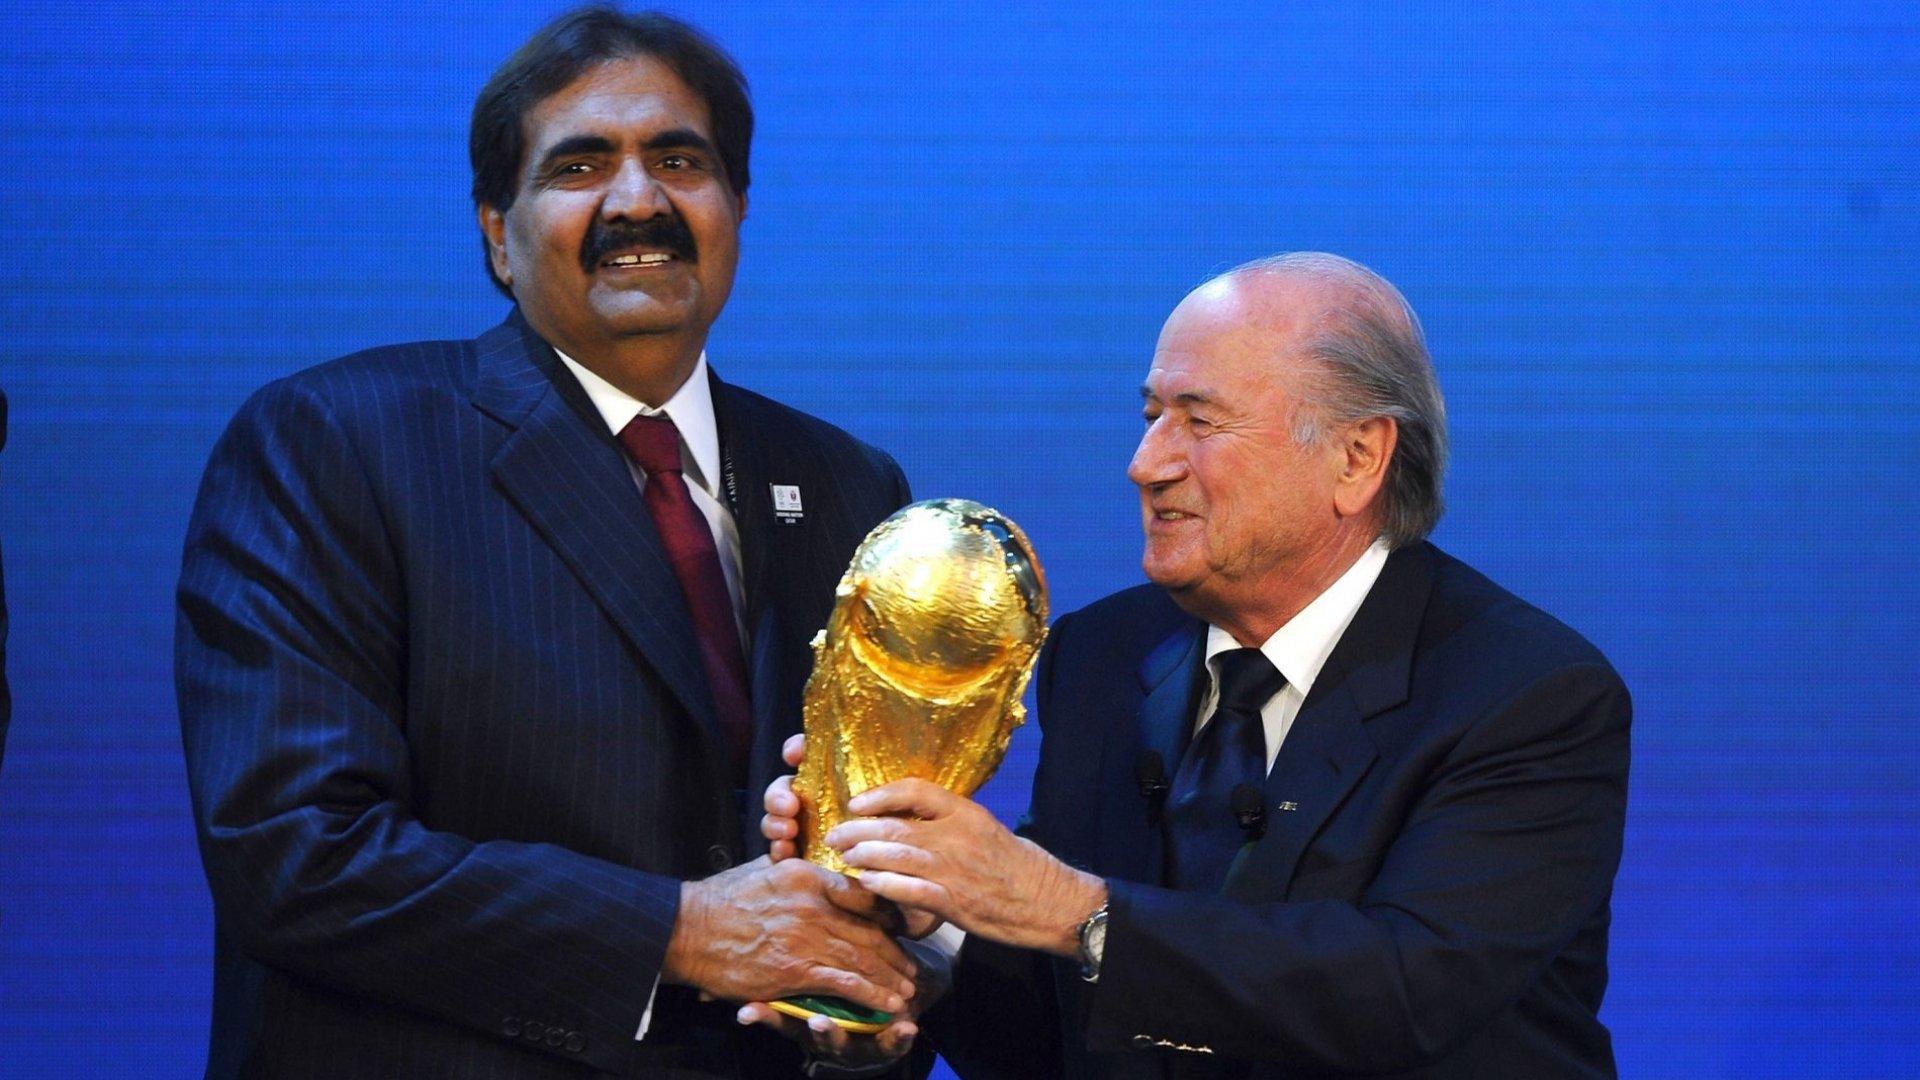 Катар си купил Мондиала с 880 милиона долара